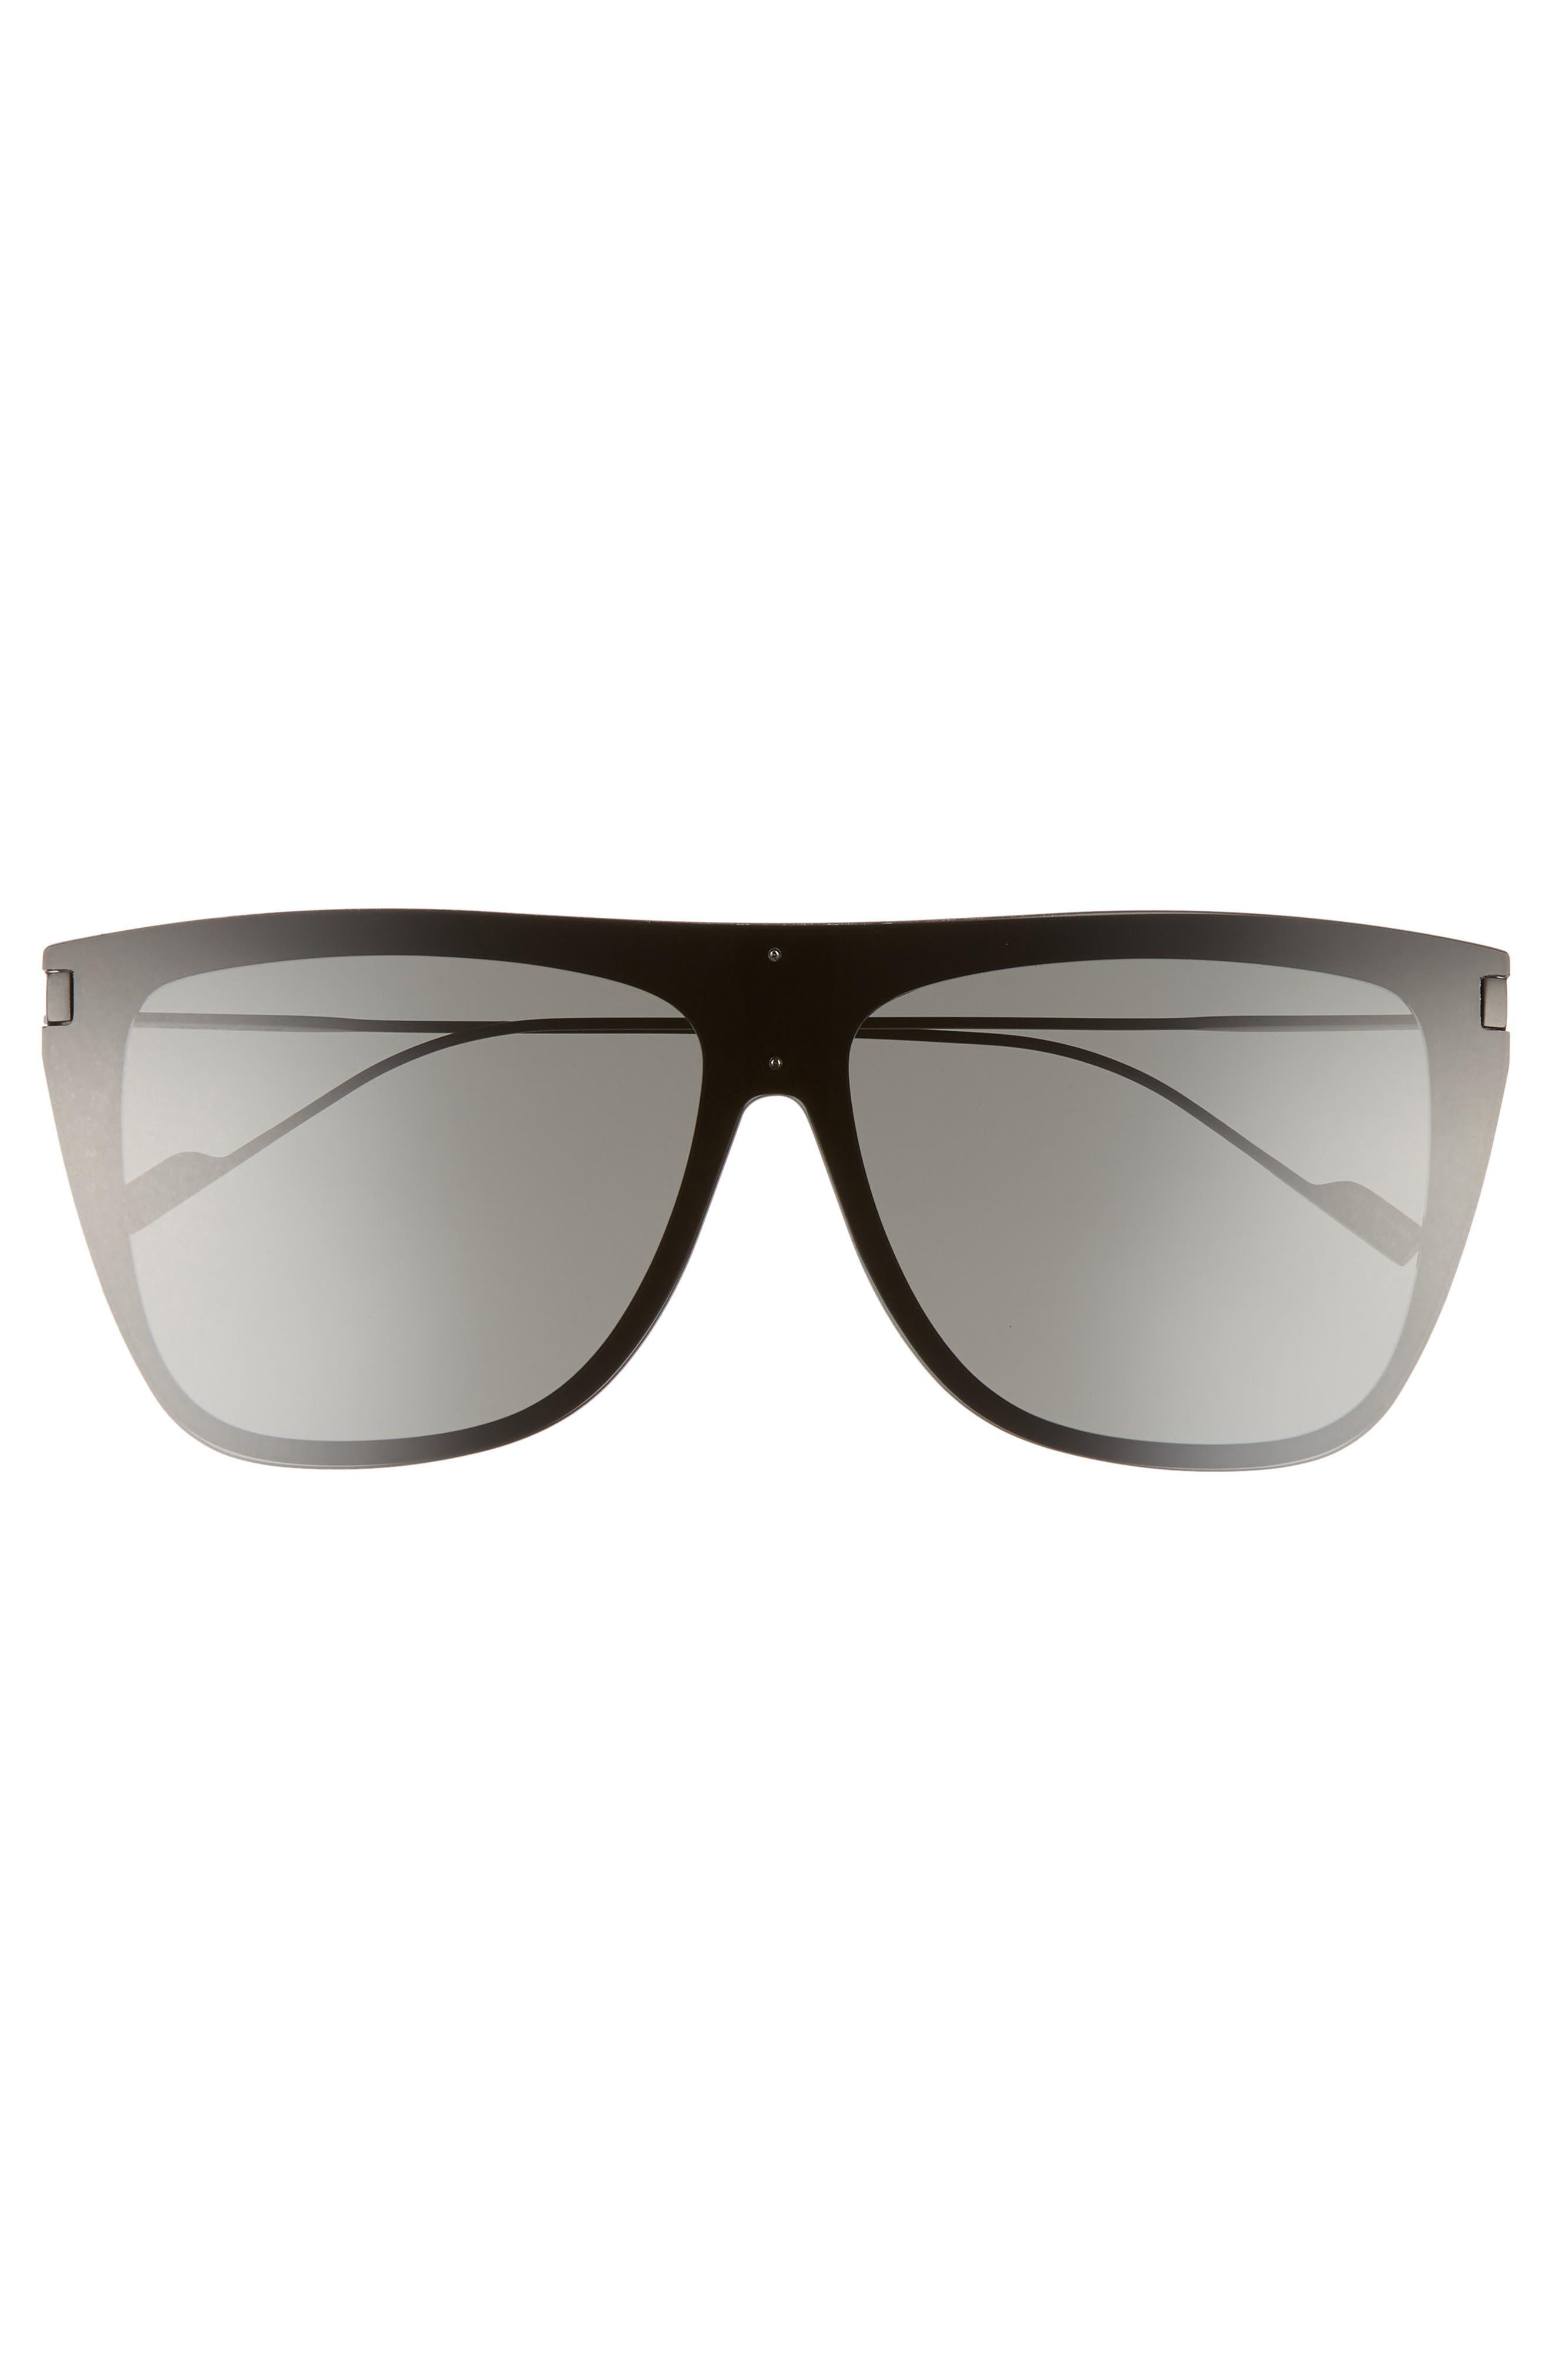 SAINT LAURENT,                             SL 1 T 59mm Flat Top Sunglasses,                             Alternate thumbnail 2, color,                             BLACK